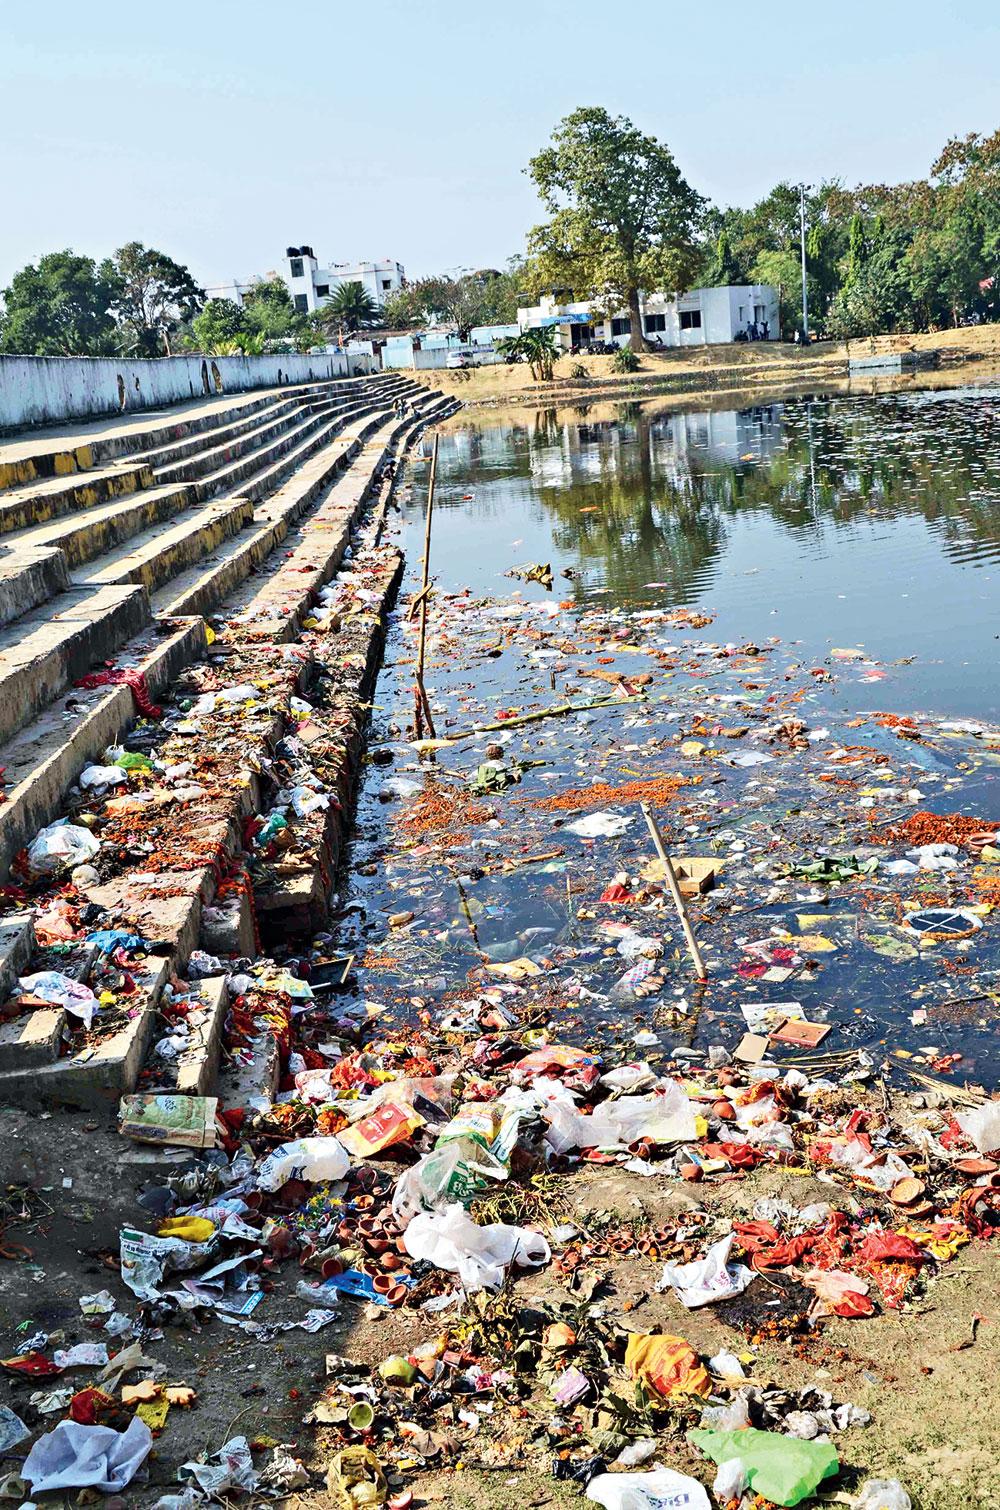 Hatania Talab near Raj Bhavan chokes on puja paraphernalia, including rotting garlands and plastic bags.